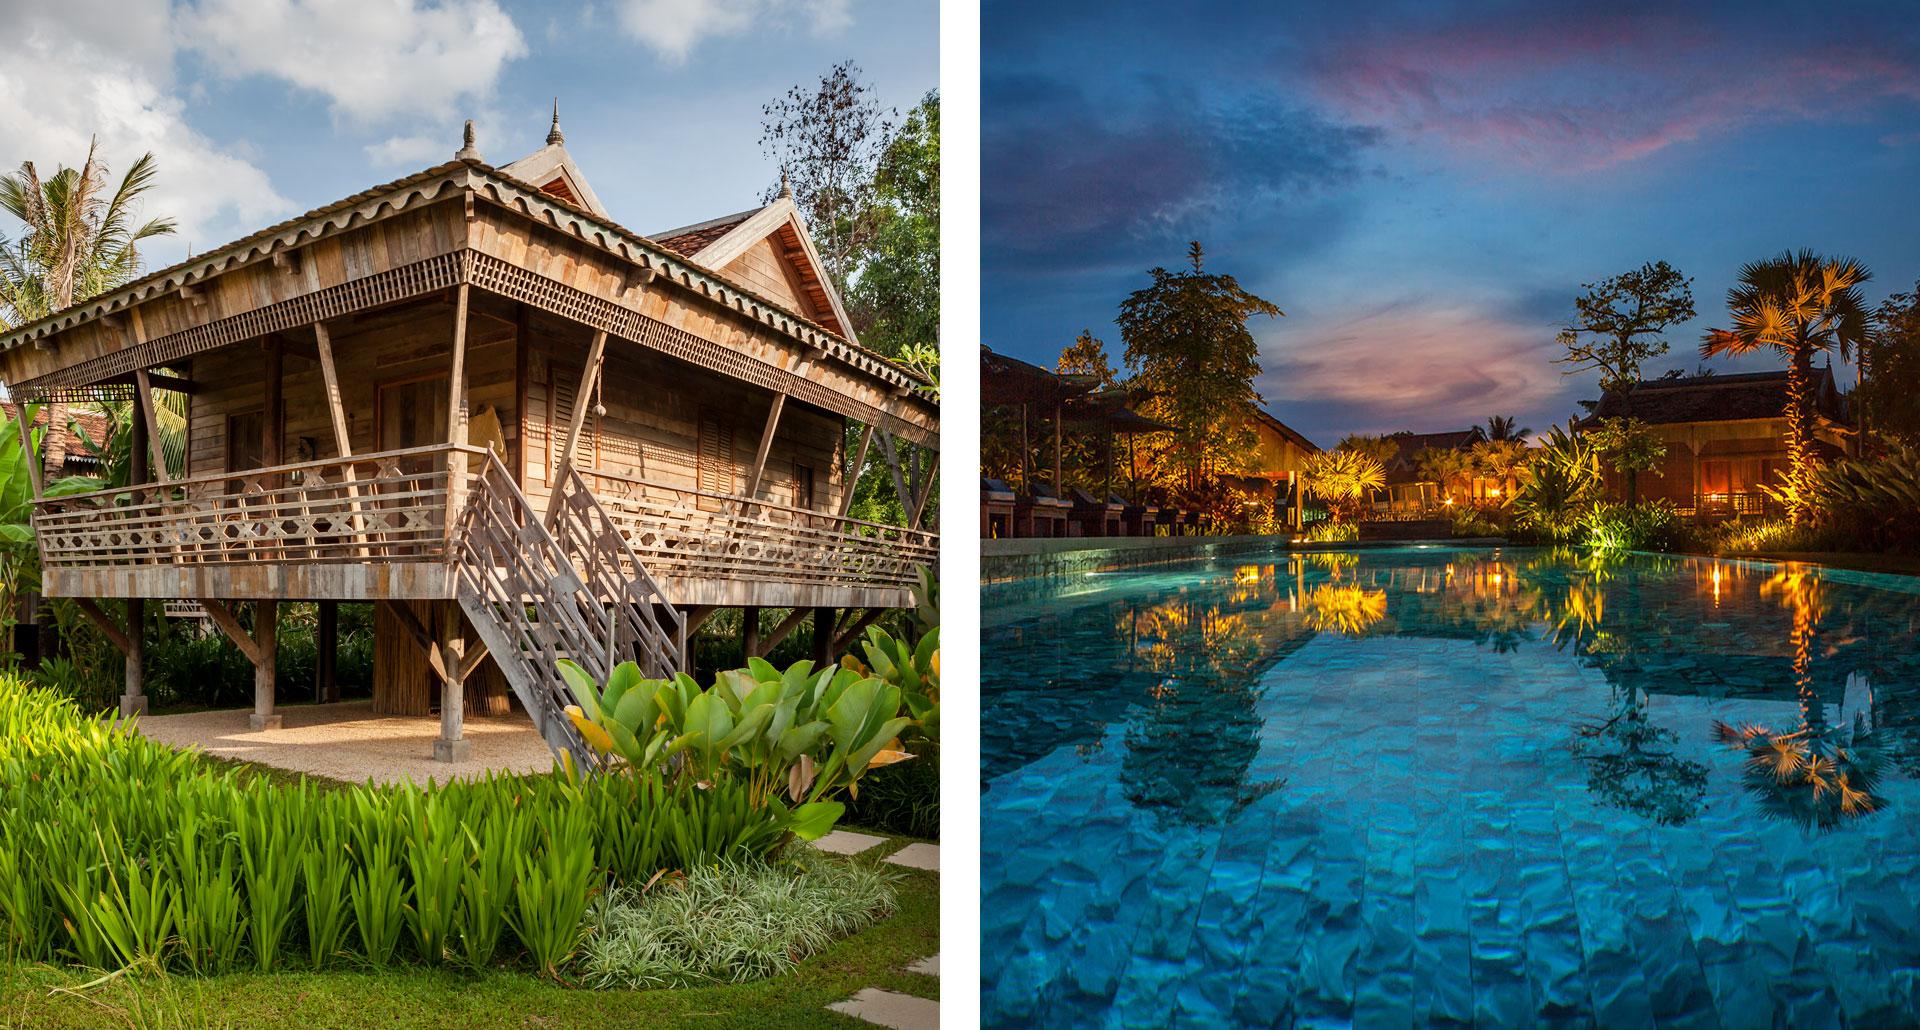 Sala Lodges - boutique hotel in Siem Reap